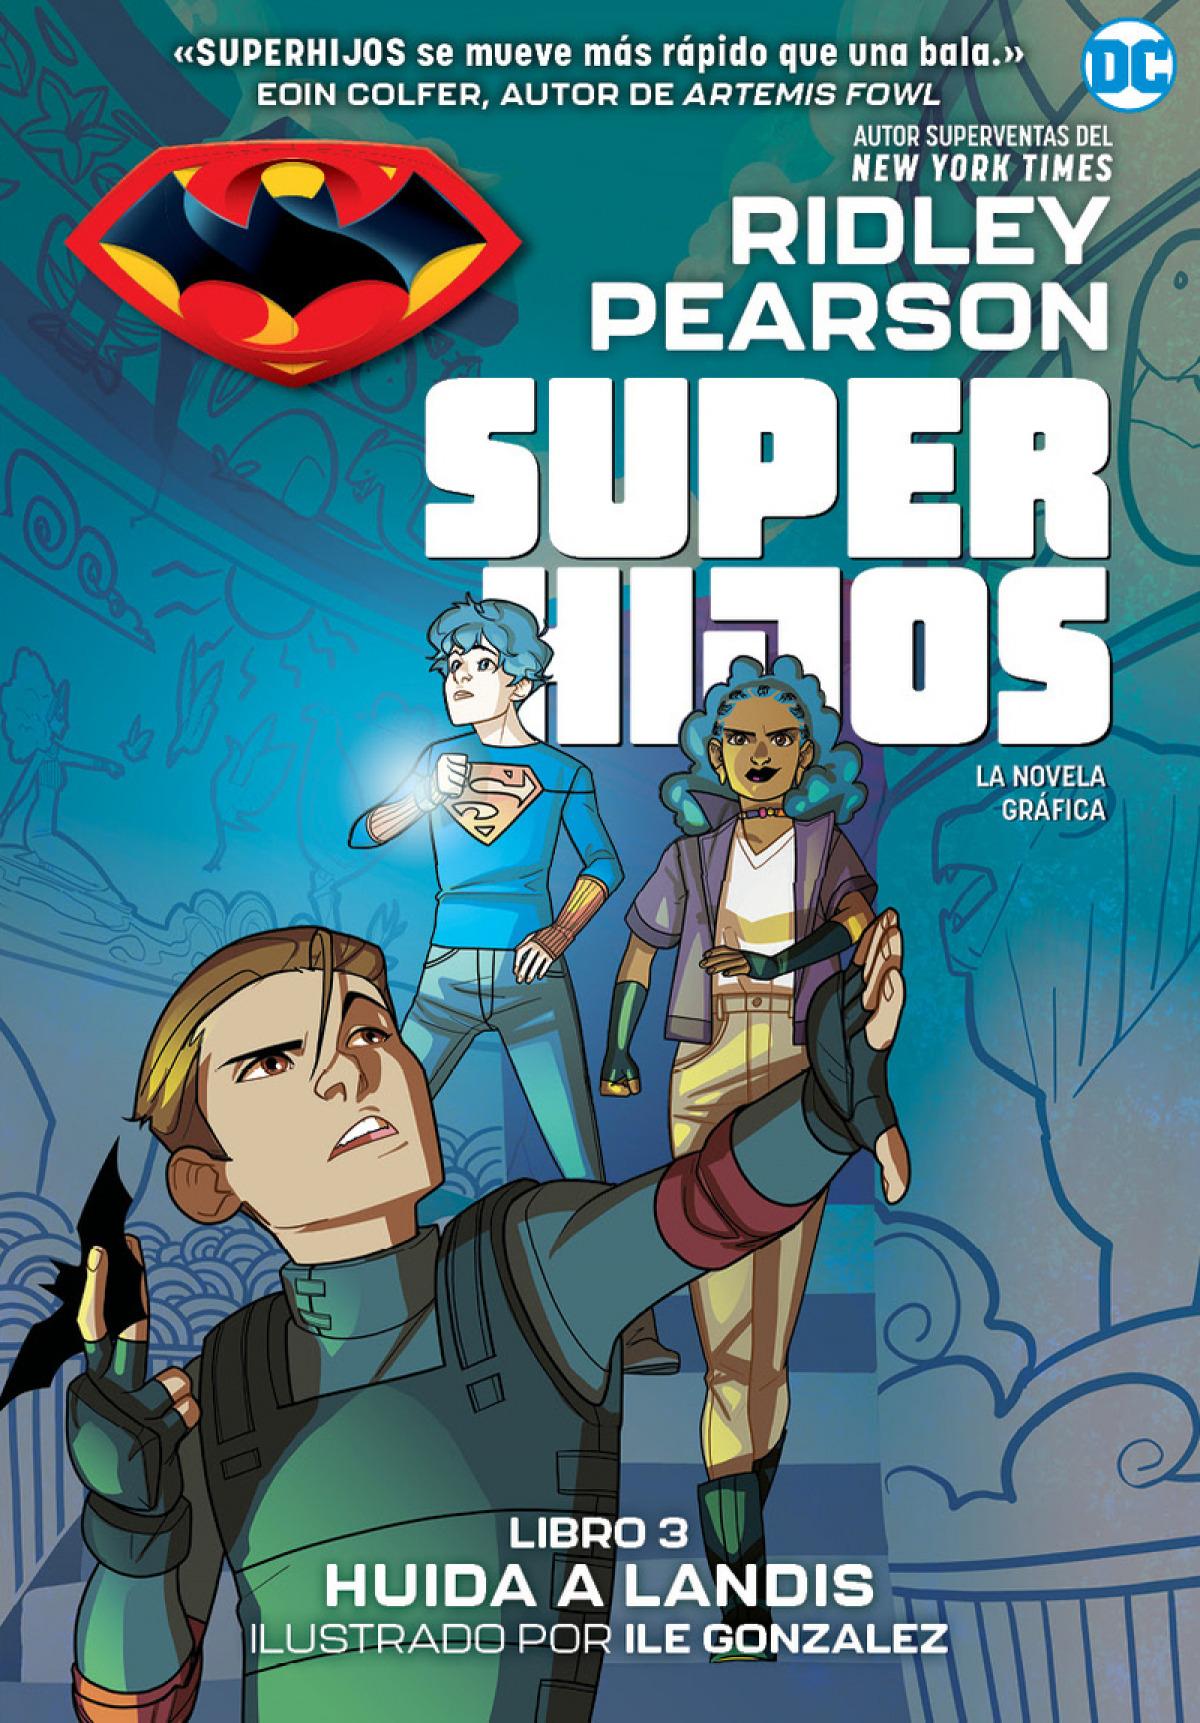 Superhijos: Huida a Landis